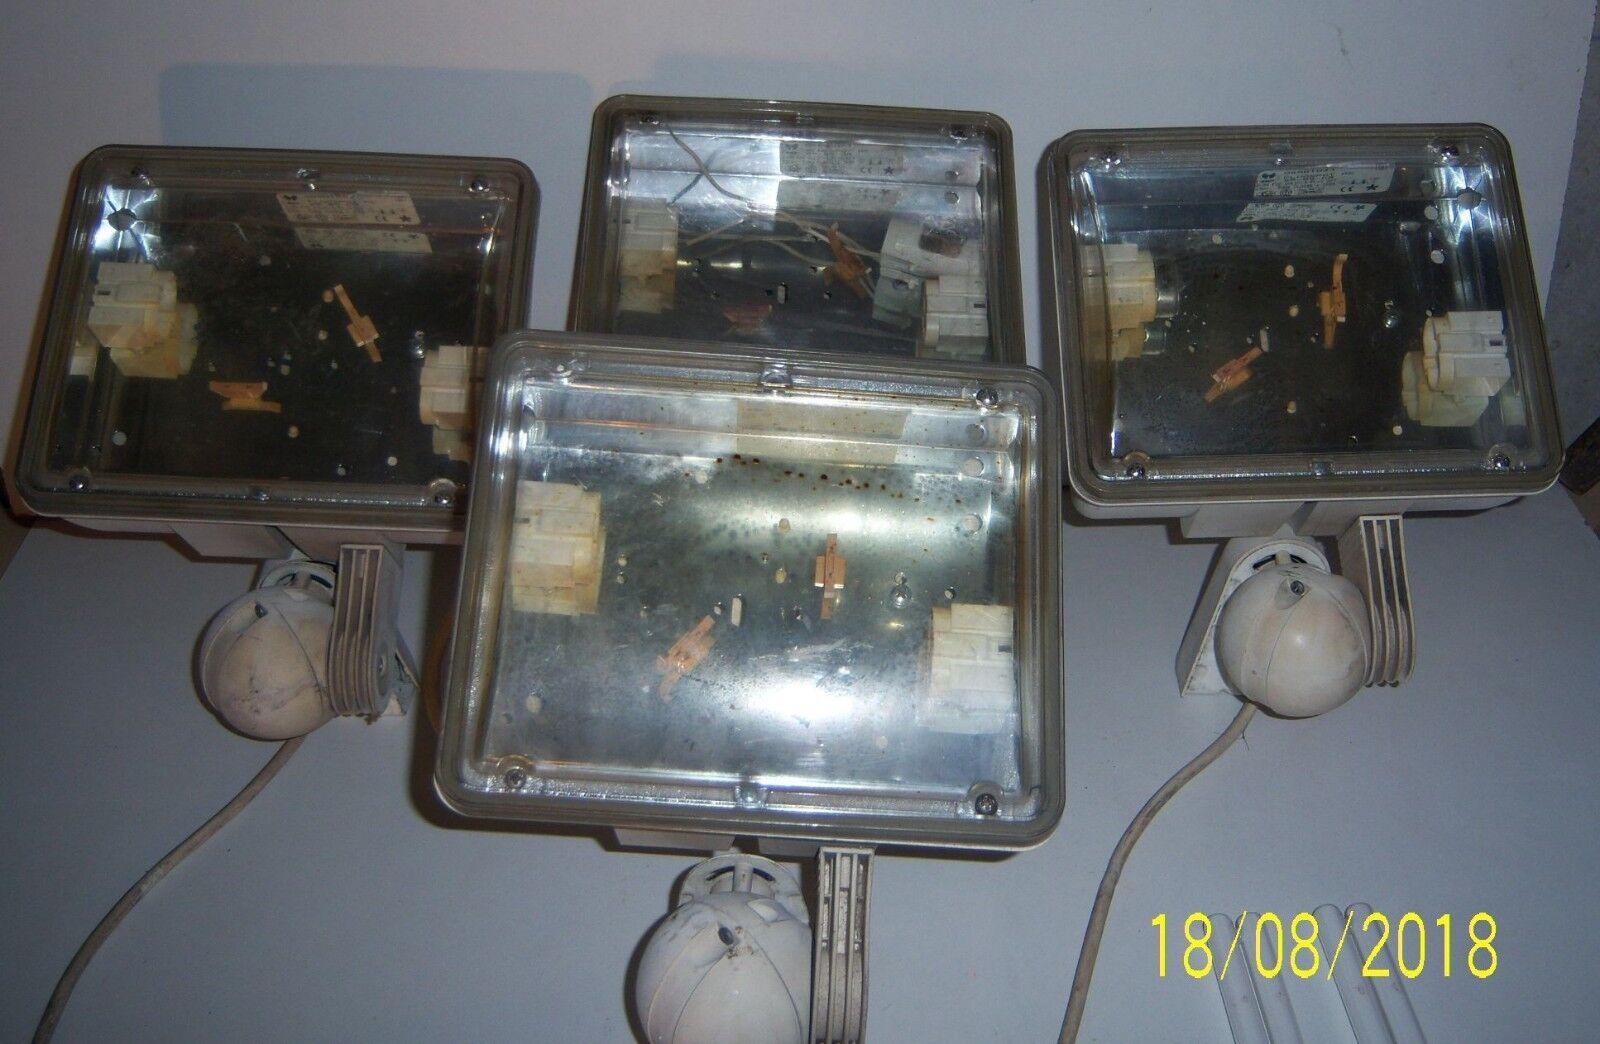 APPLIQUES MURAL LAMPE FLUORESCENTE INTÉ  EXTÉ FLUOSPOT PC 29-85-CR 2 X 9 WATTS .